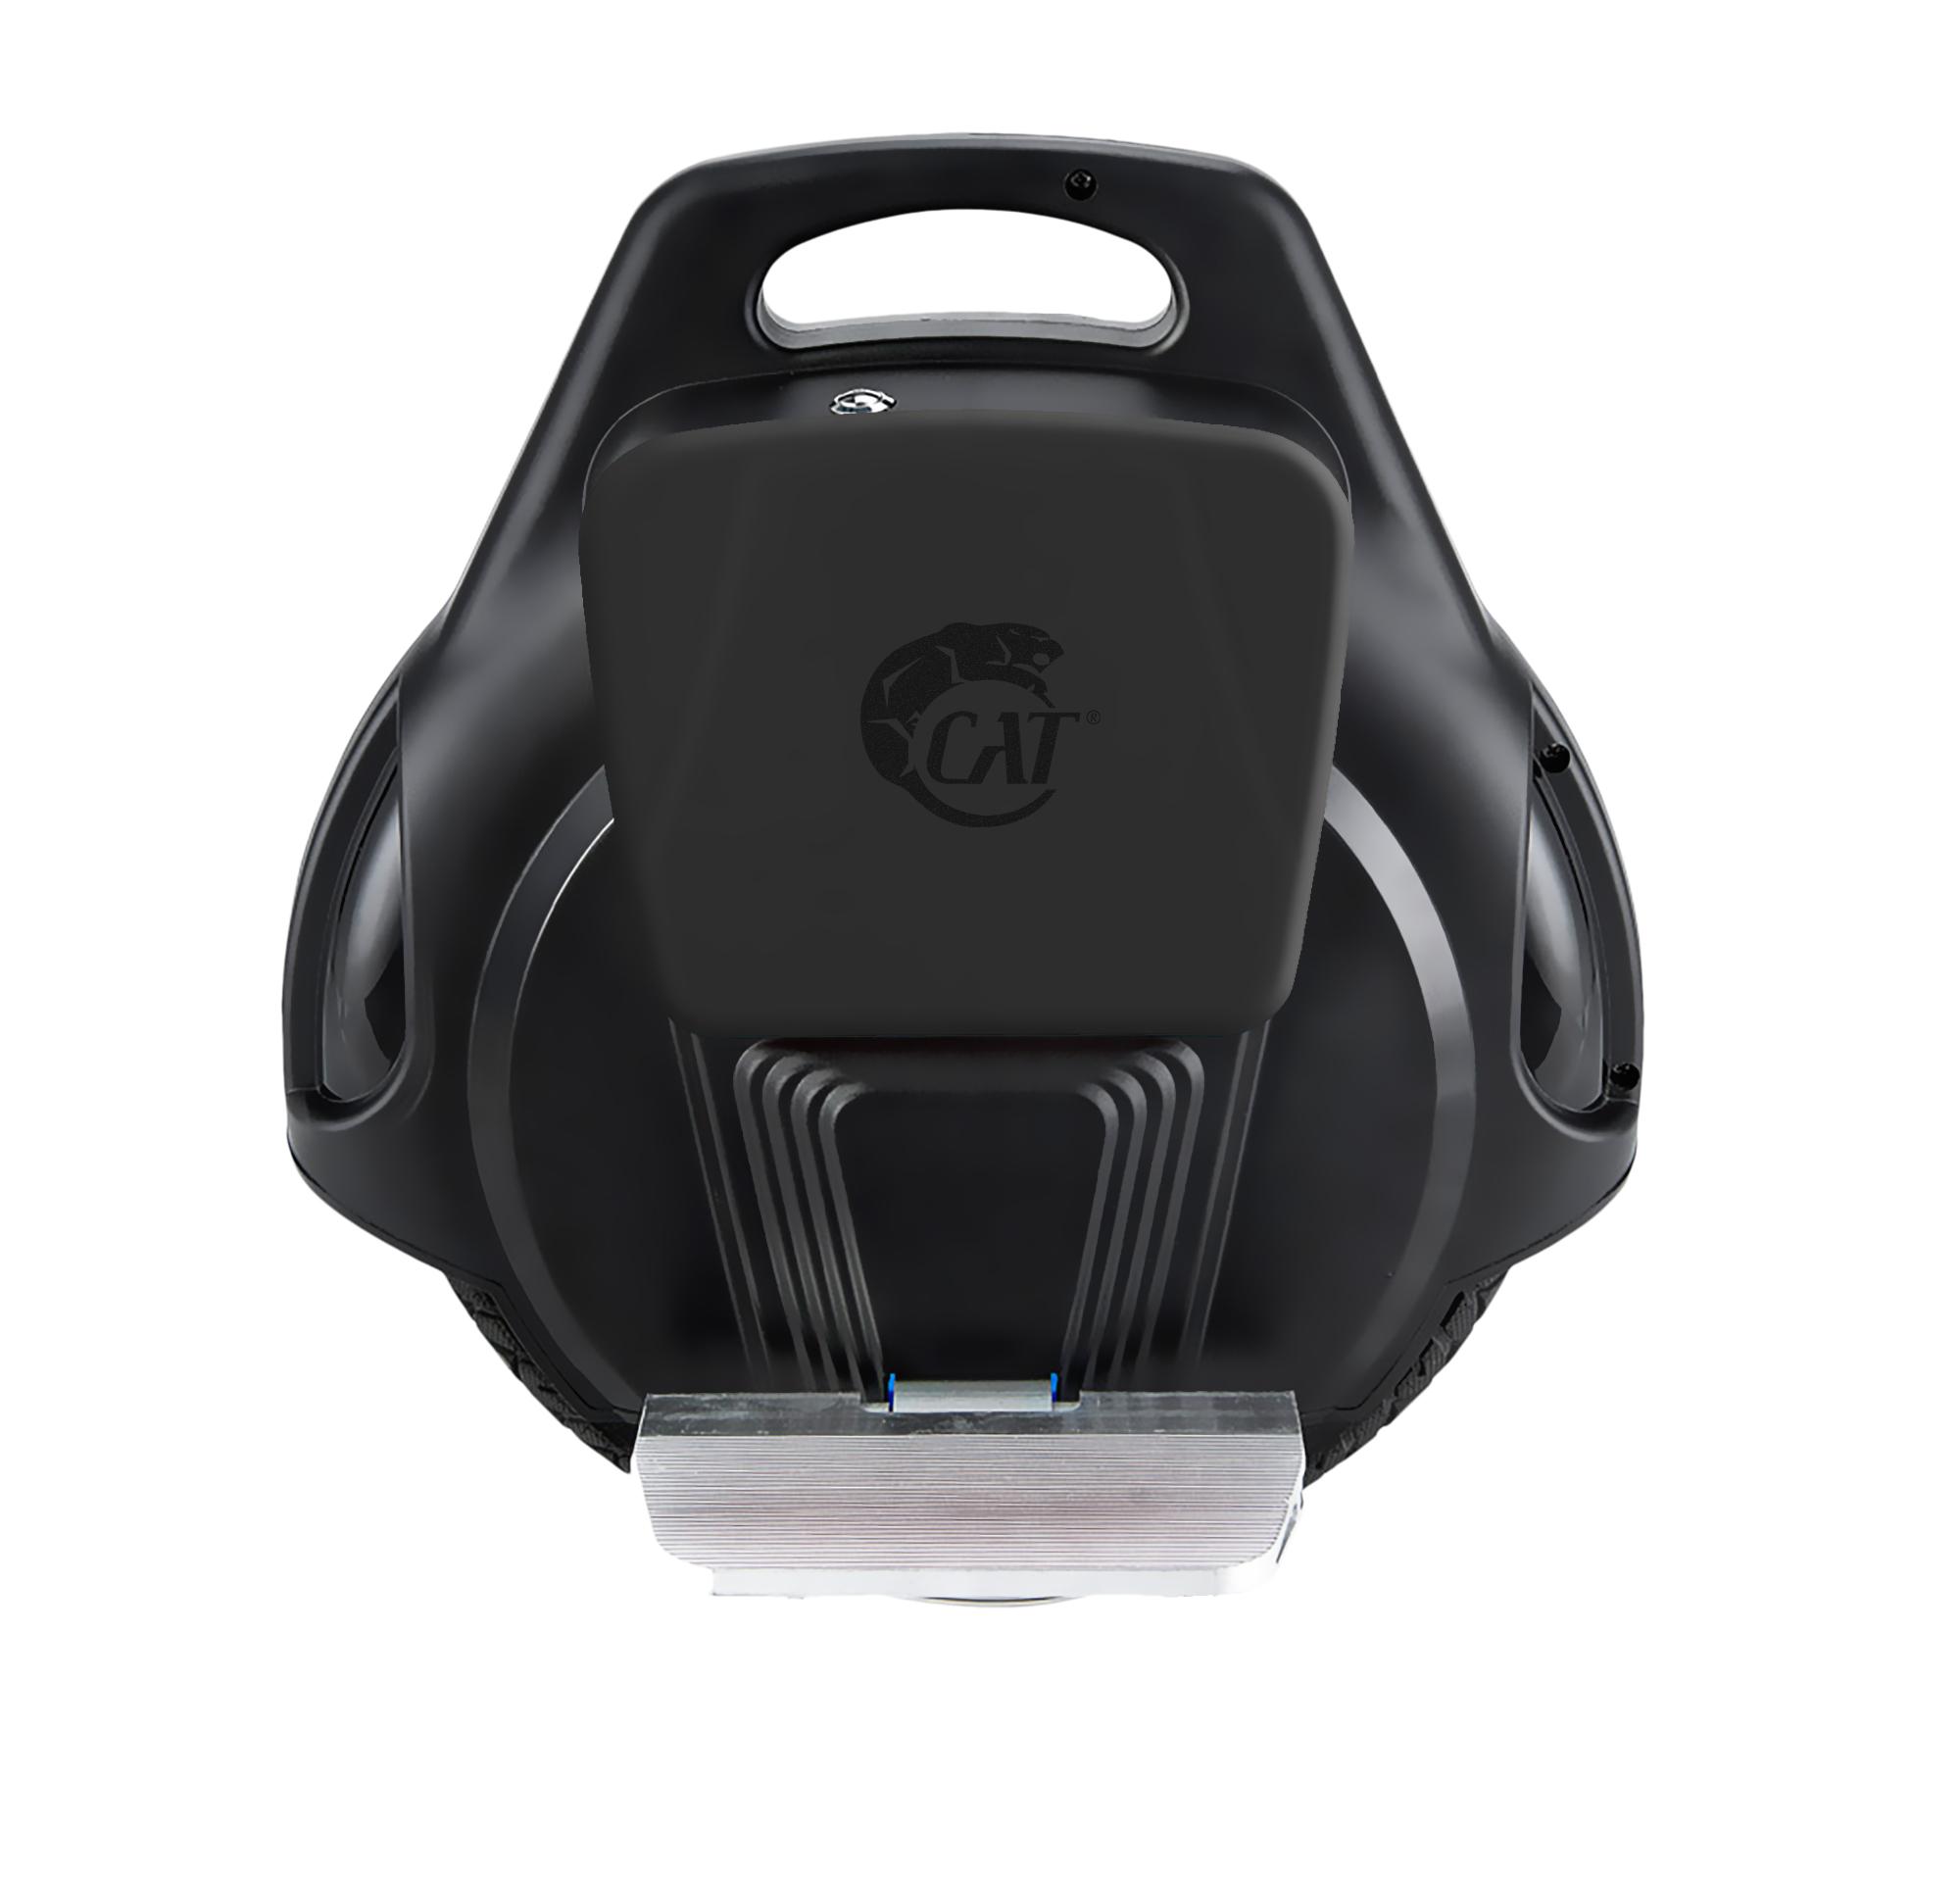 cat 1droid elektrischer balance scooter einrad elektro. Black Bedroom Furniture Sets. Home Design Ideas